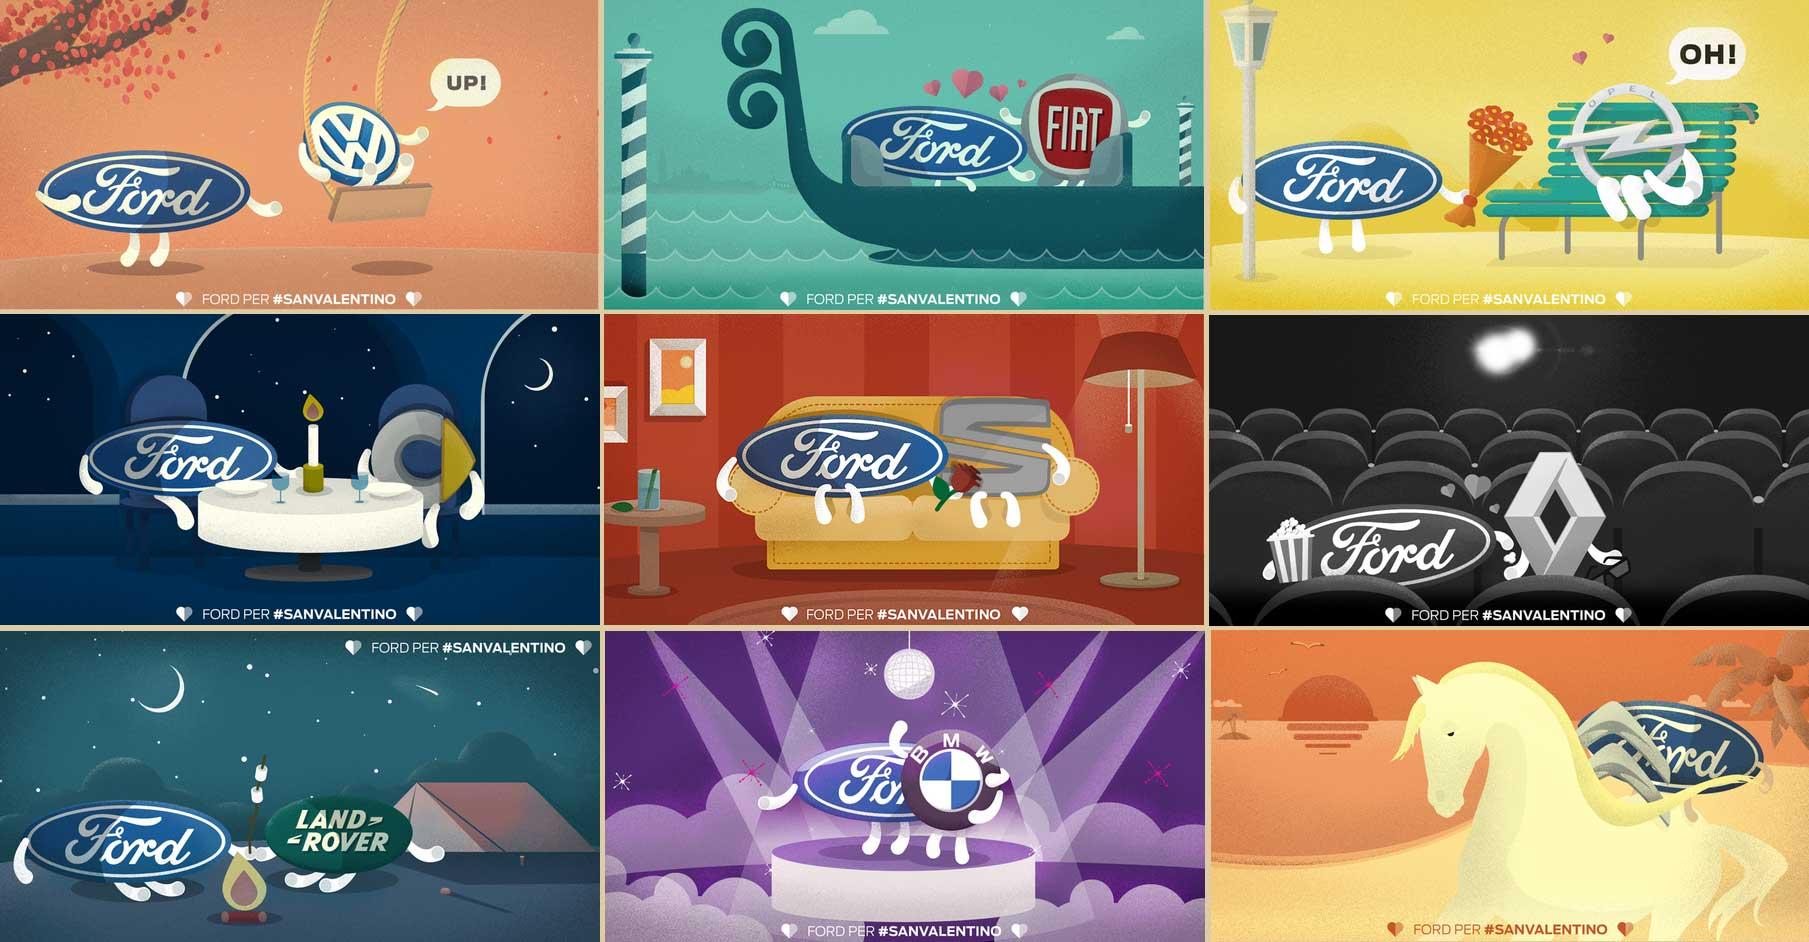 la campagna twitter di Ford per San Valentino - www.gorgonia.it